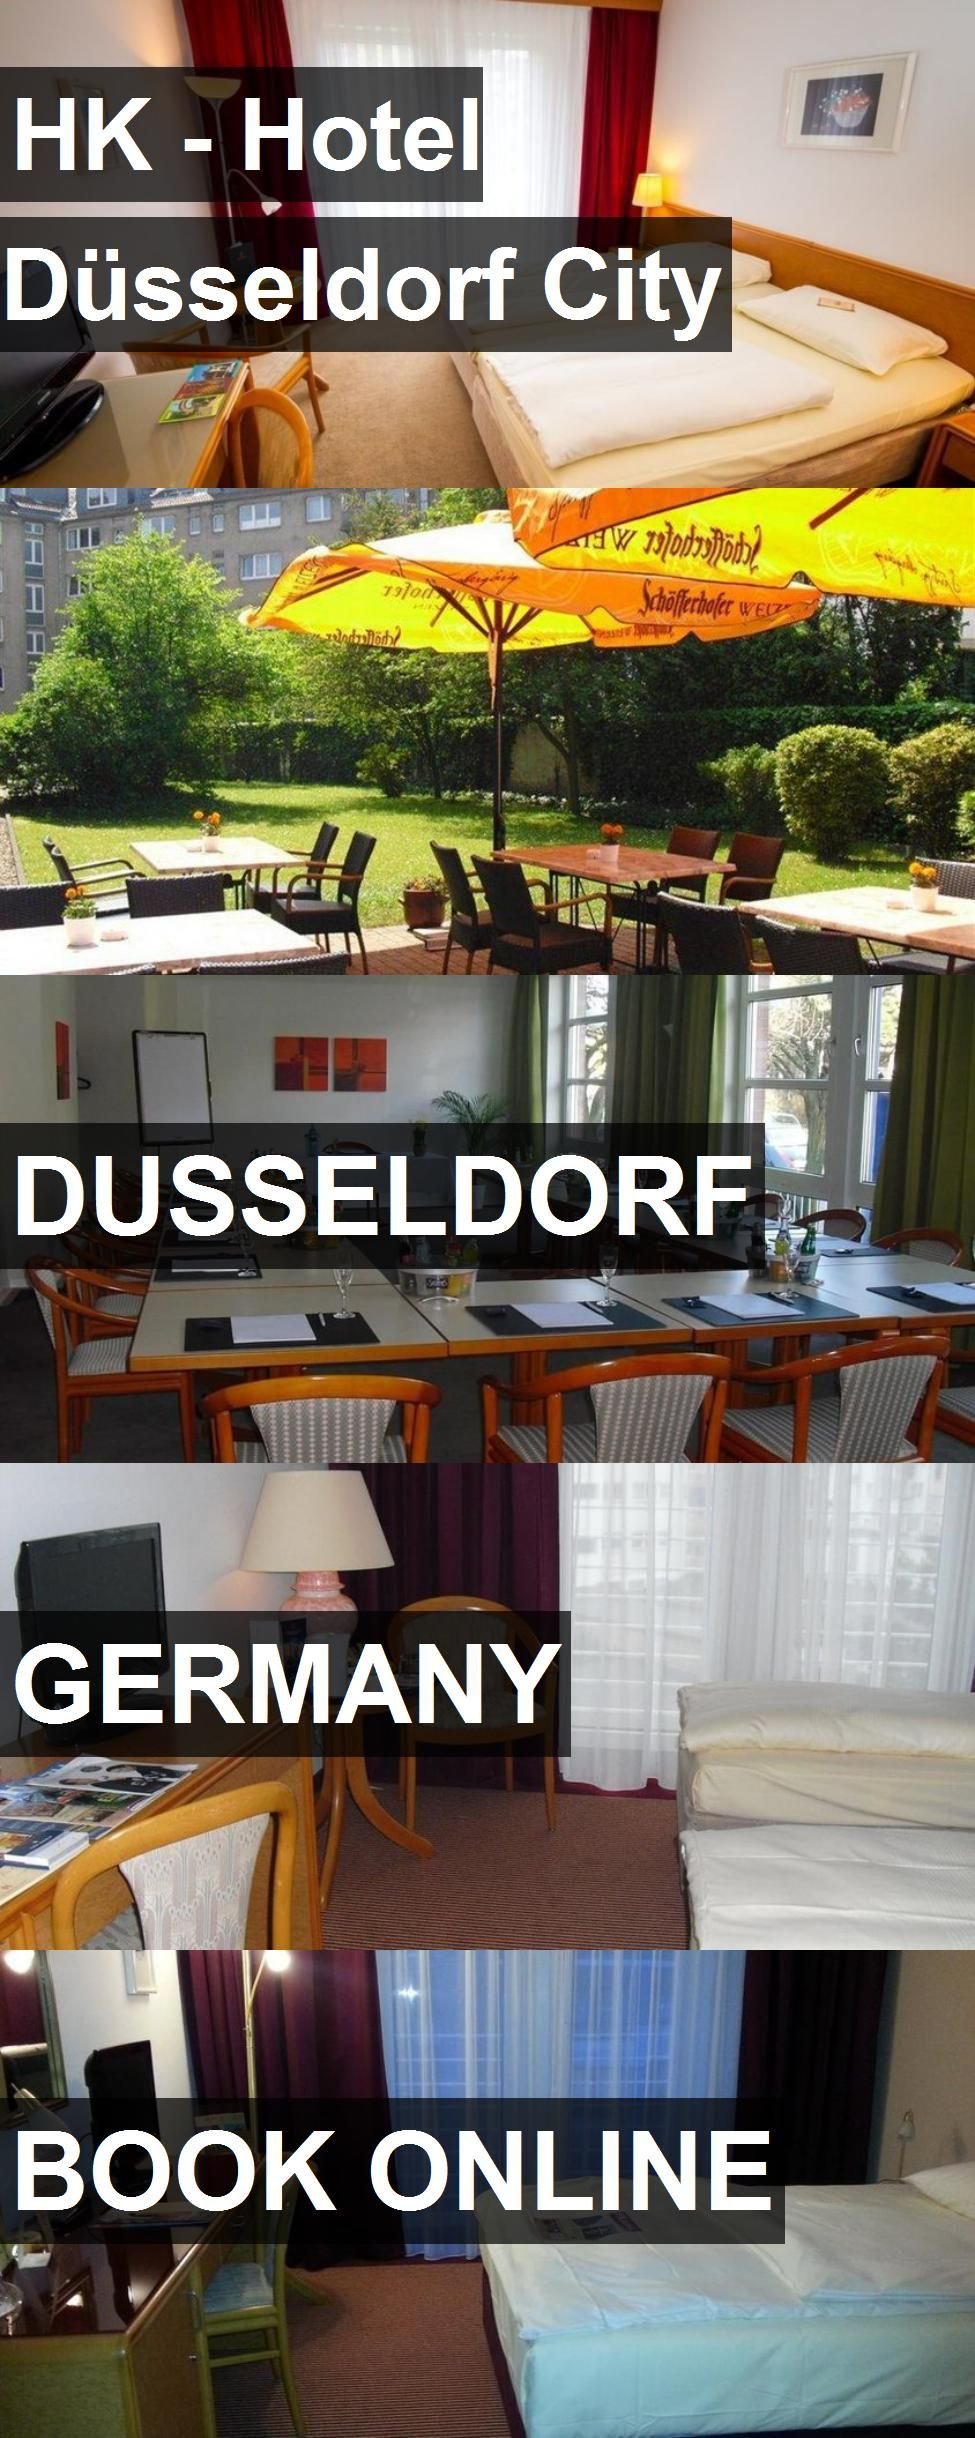 HK - Hotel Düsseldorf City in Dusseldorf, Germany. For